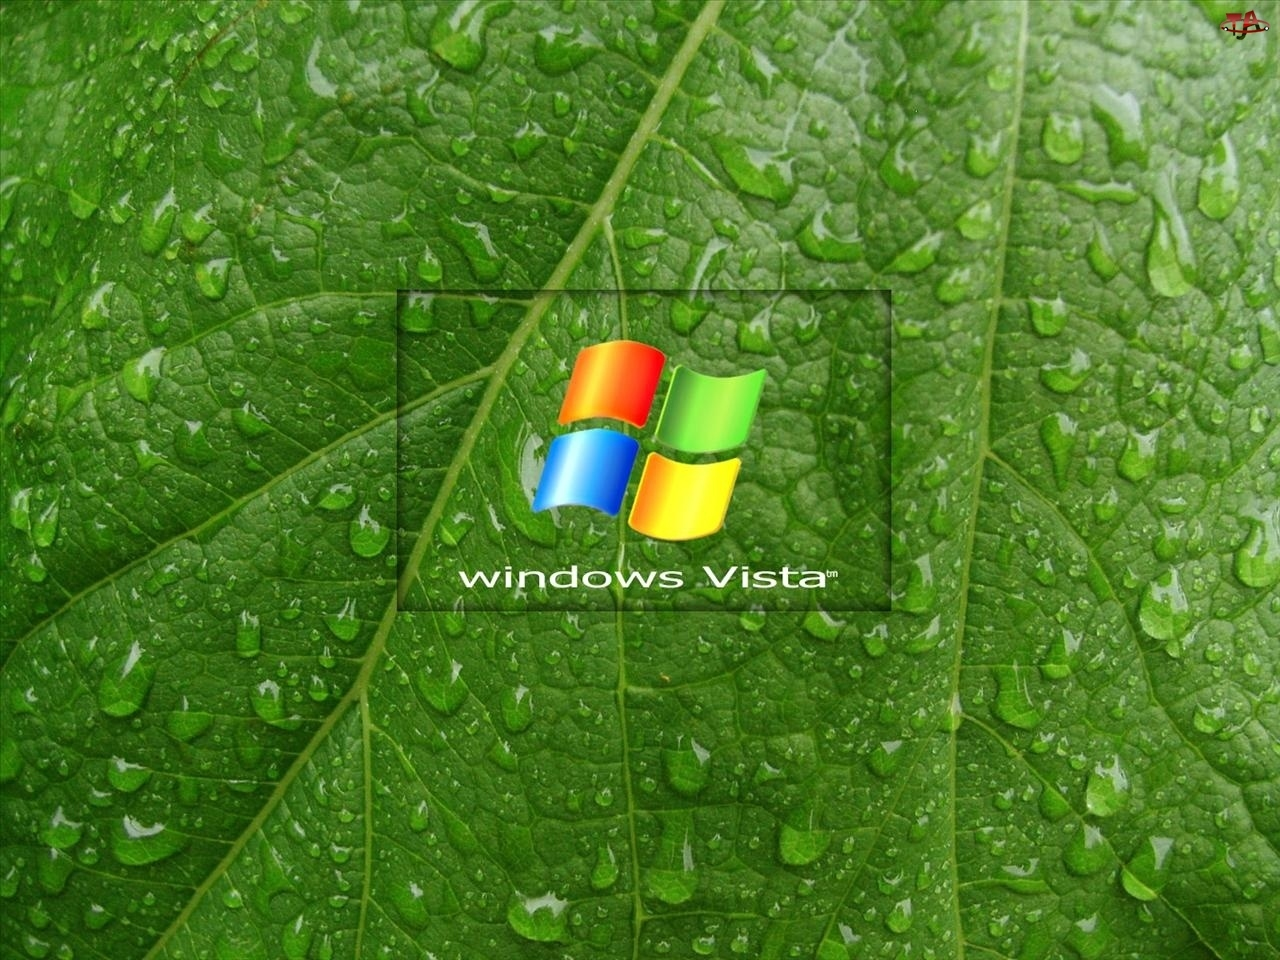 Wody, Windows, Liść, Vista, Krople